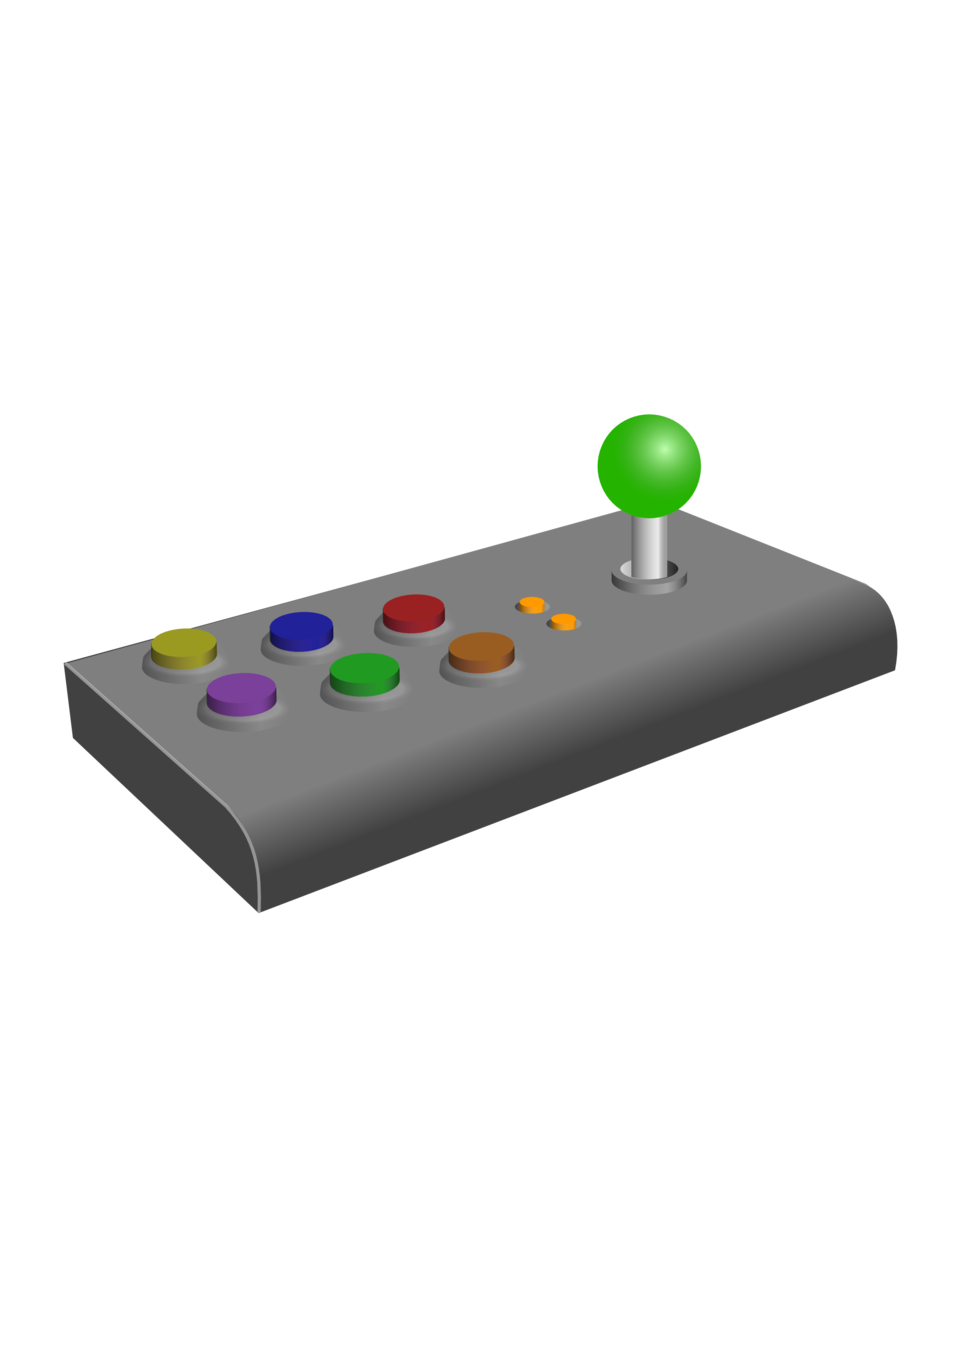 Retro Arcade Joystick